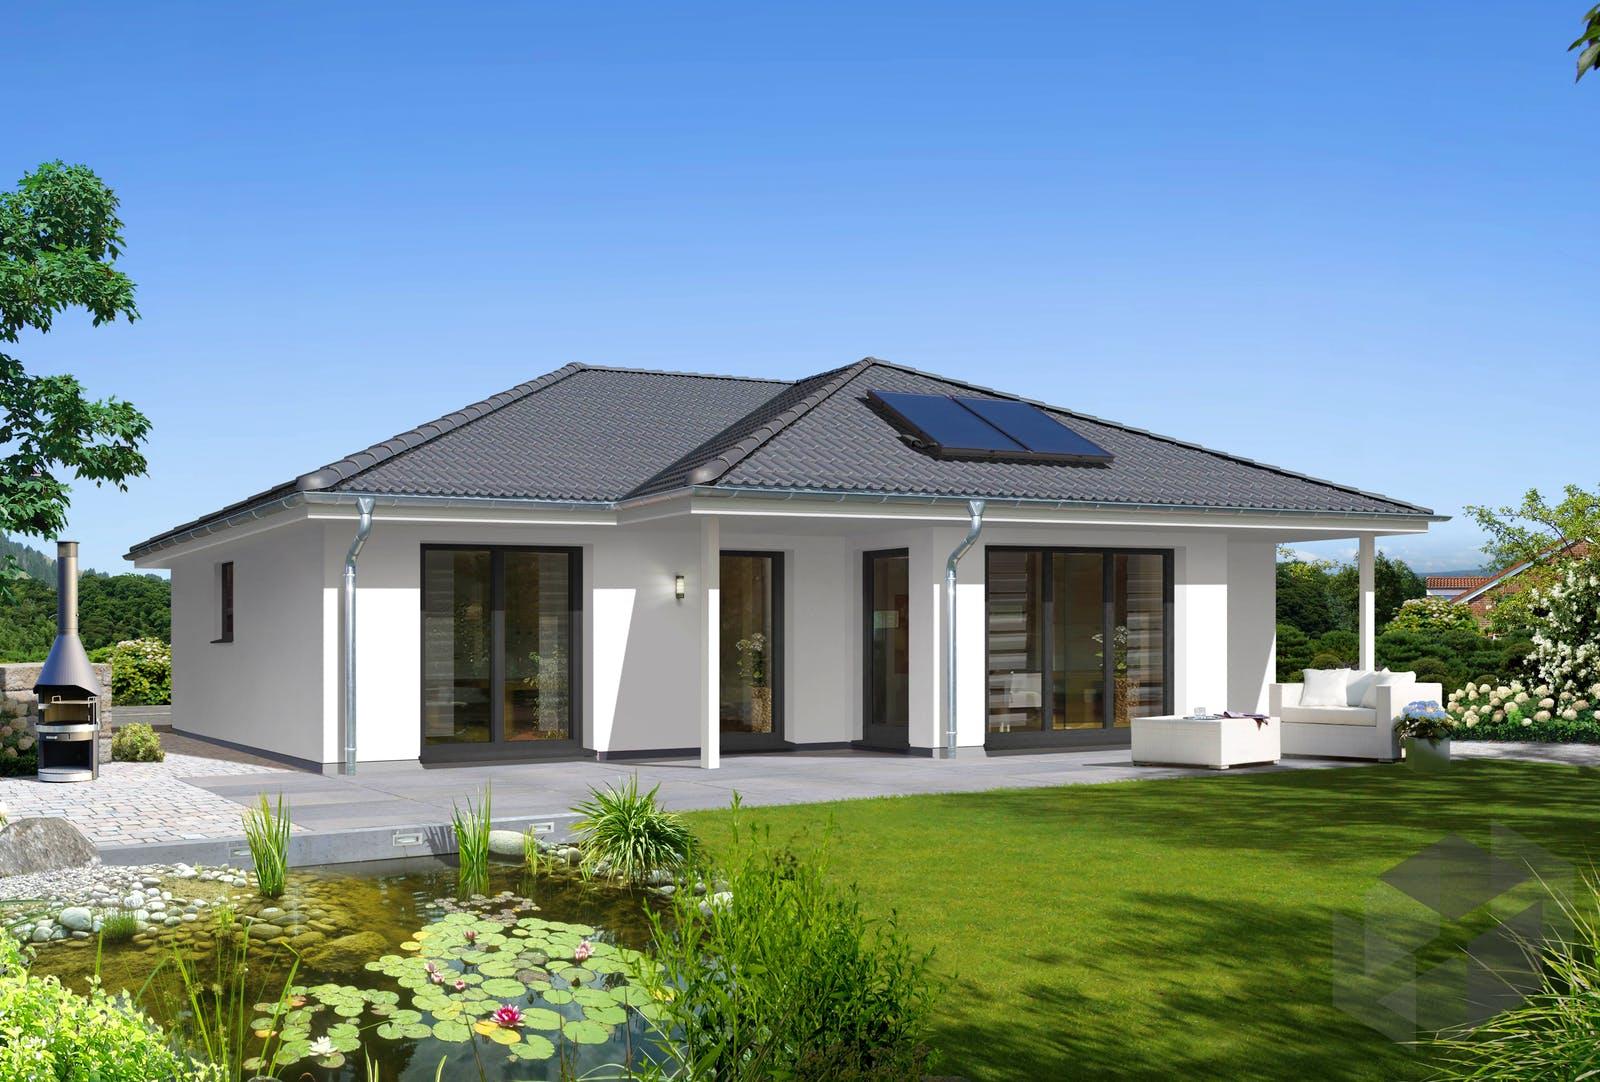 massivhaus bungalow 128 var trend von town country haus. Black Bedroom Furniture Sets. Home Design Ideas